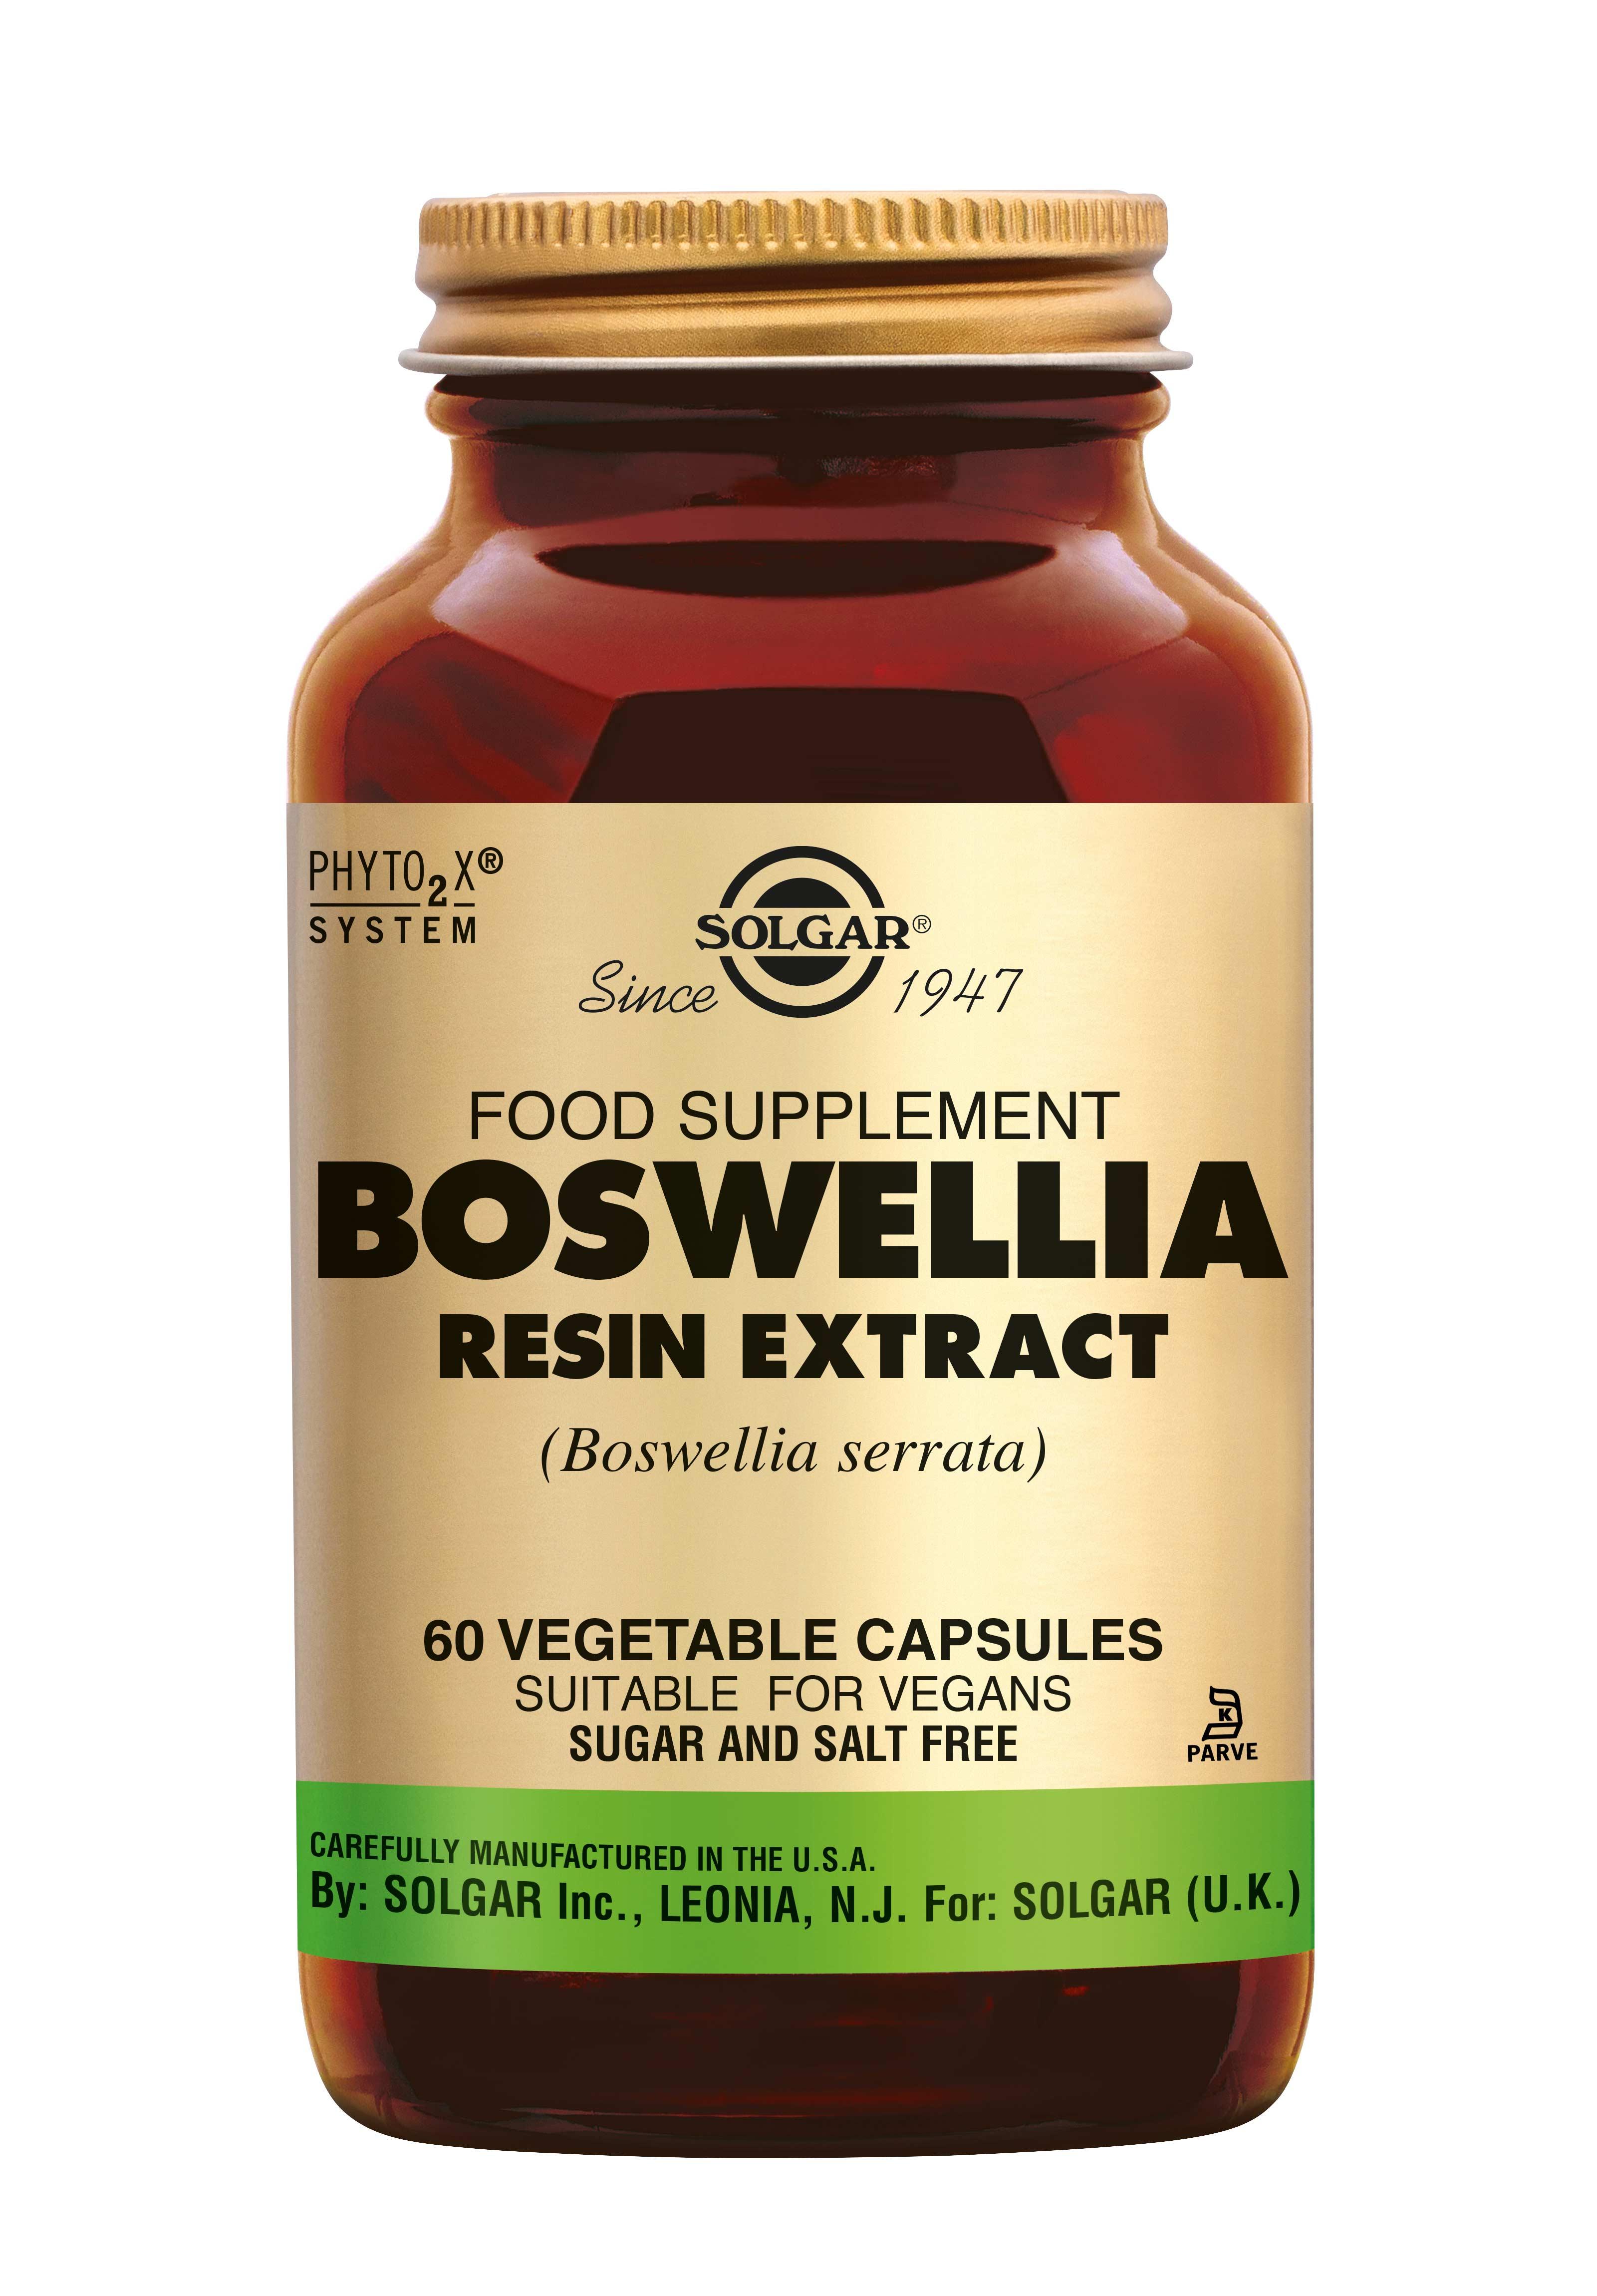 Boswellia Resin Extract, Solgar, Solgar Boswellia Resin Extract (Boswellia serrata) wordt ingezet voor behoud van soepele gewrichten.